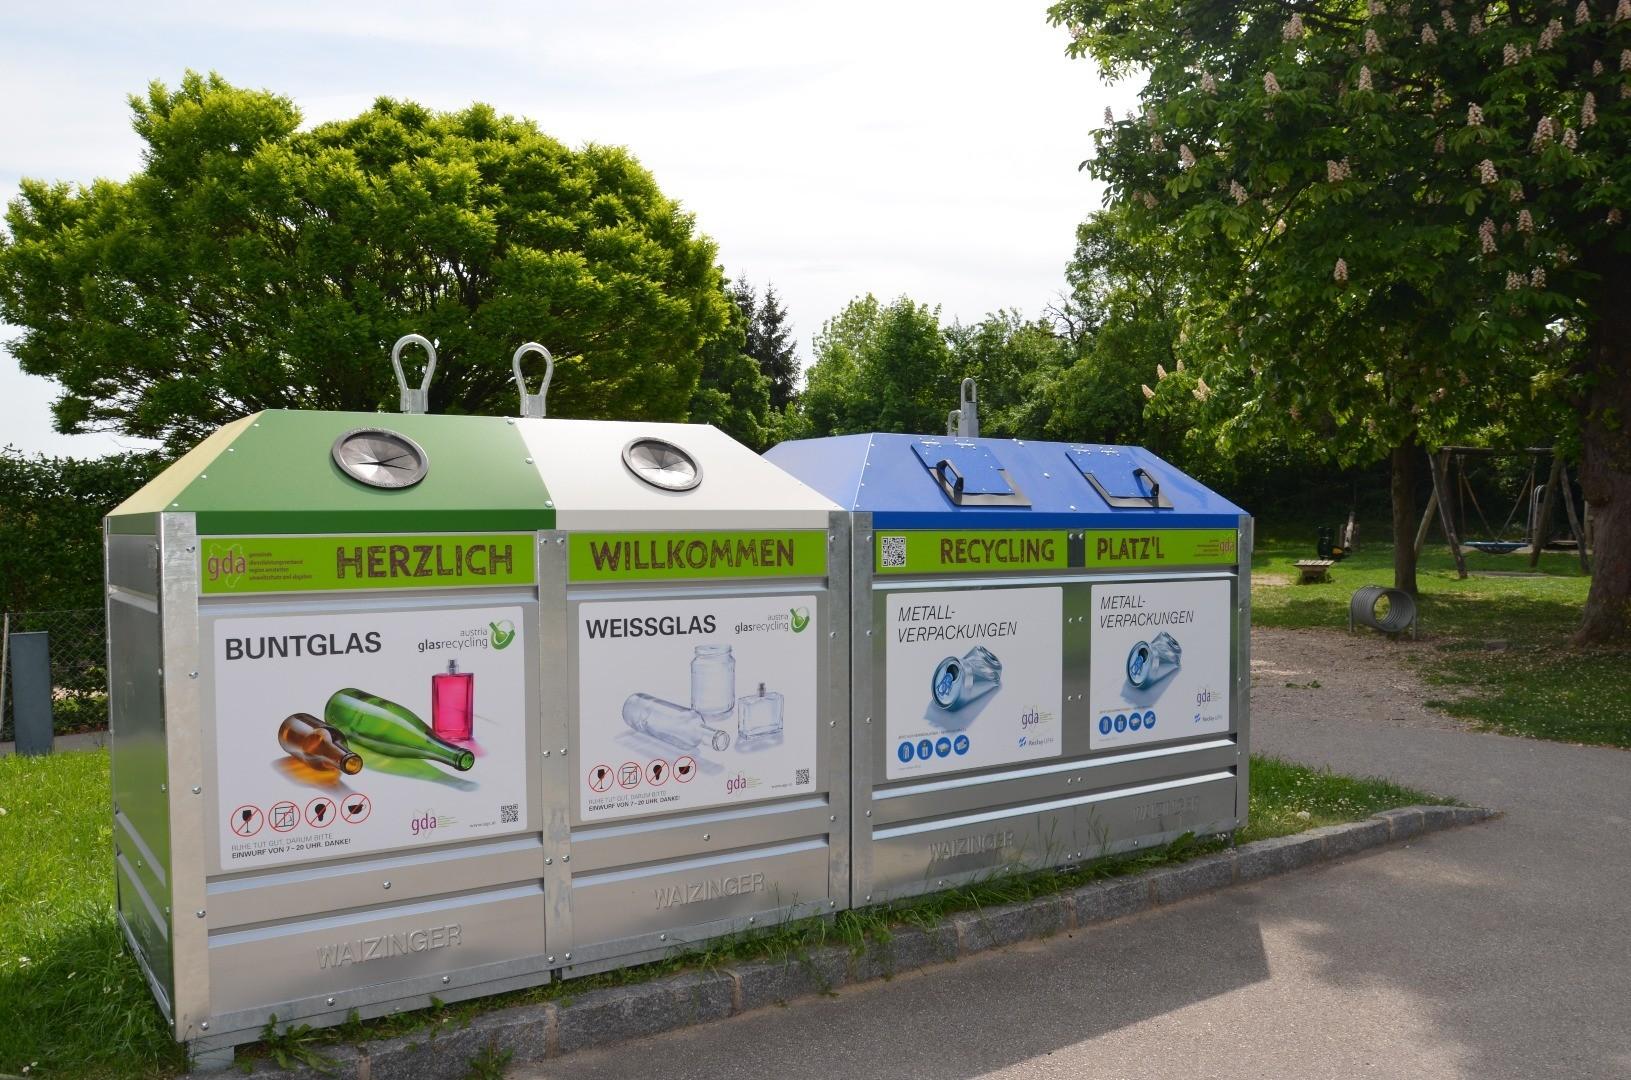 Recycling Platzl.jpg